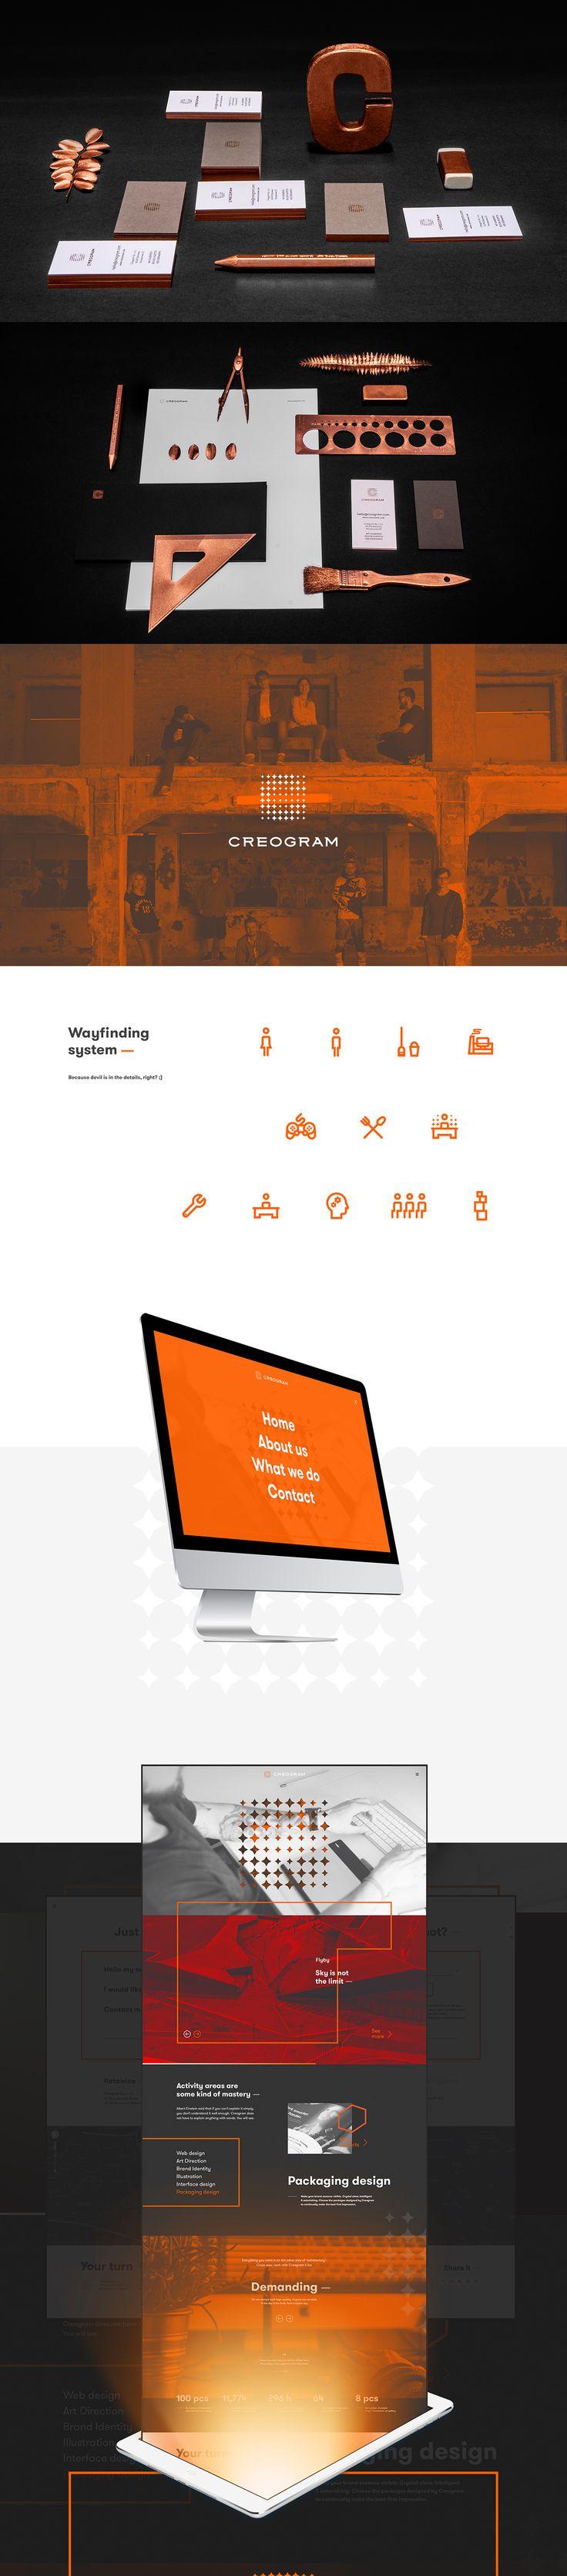 Creogram on Branding Served